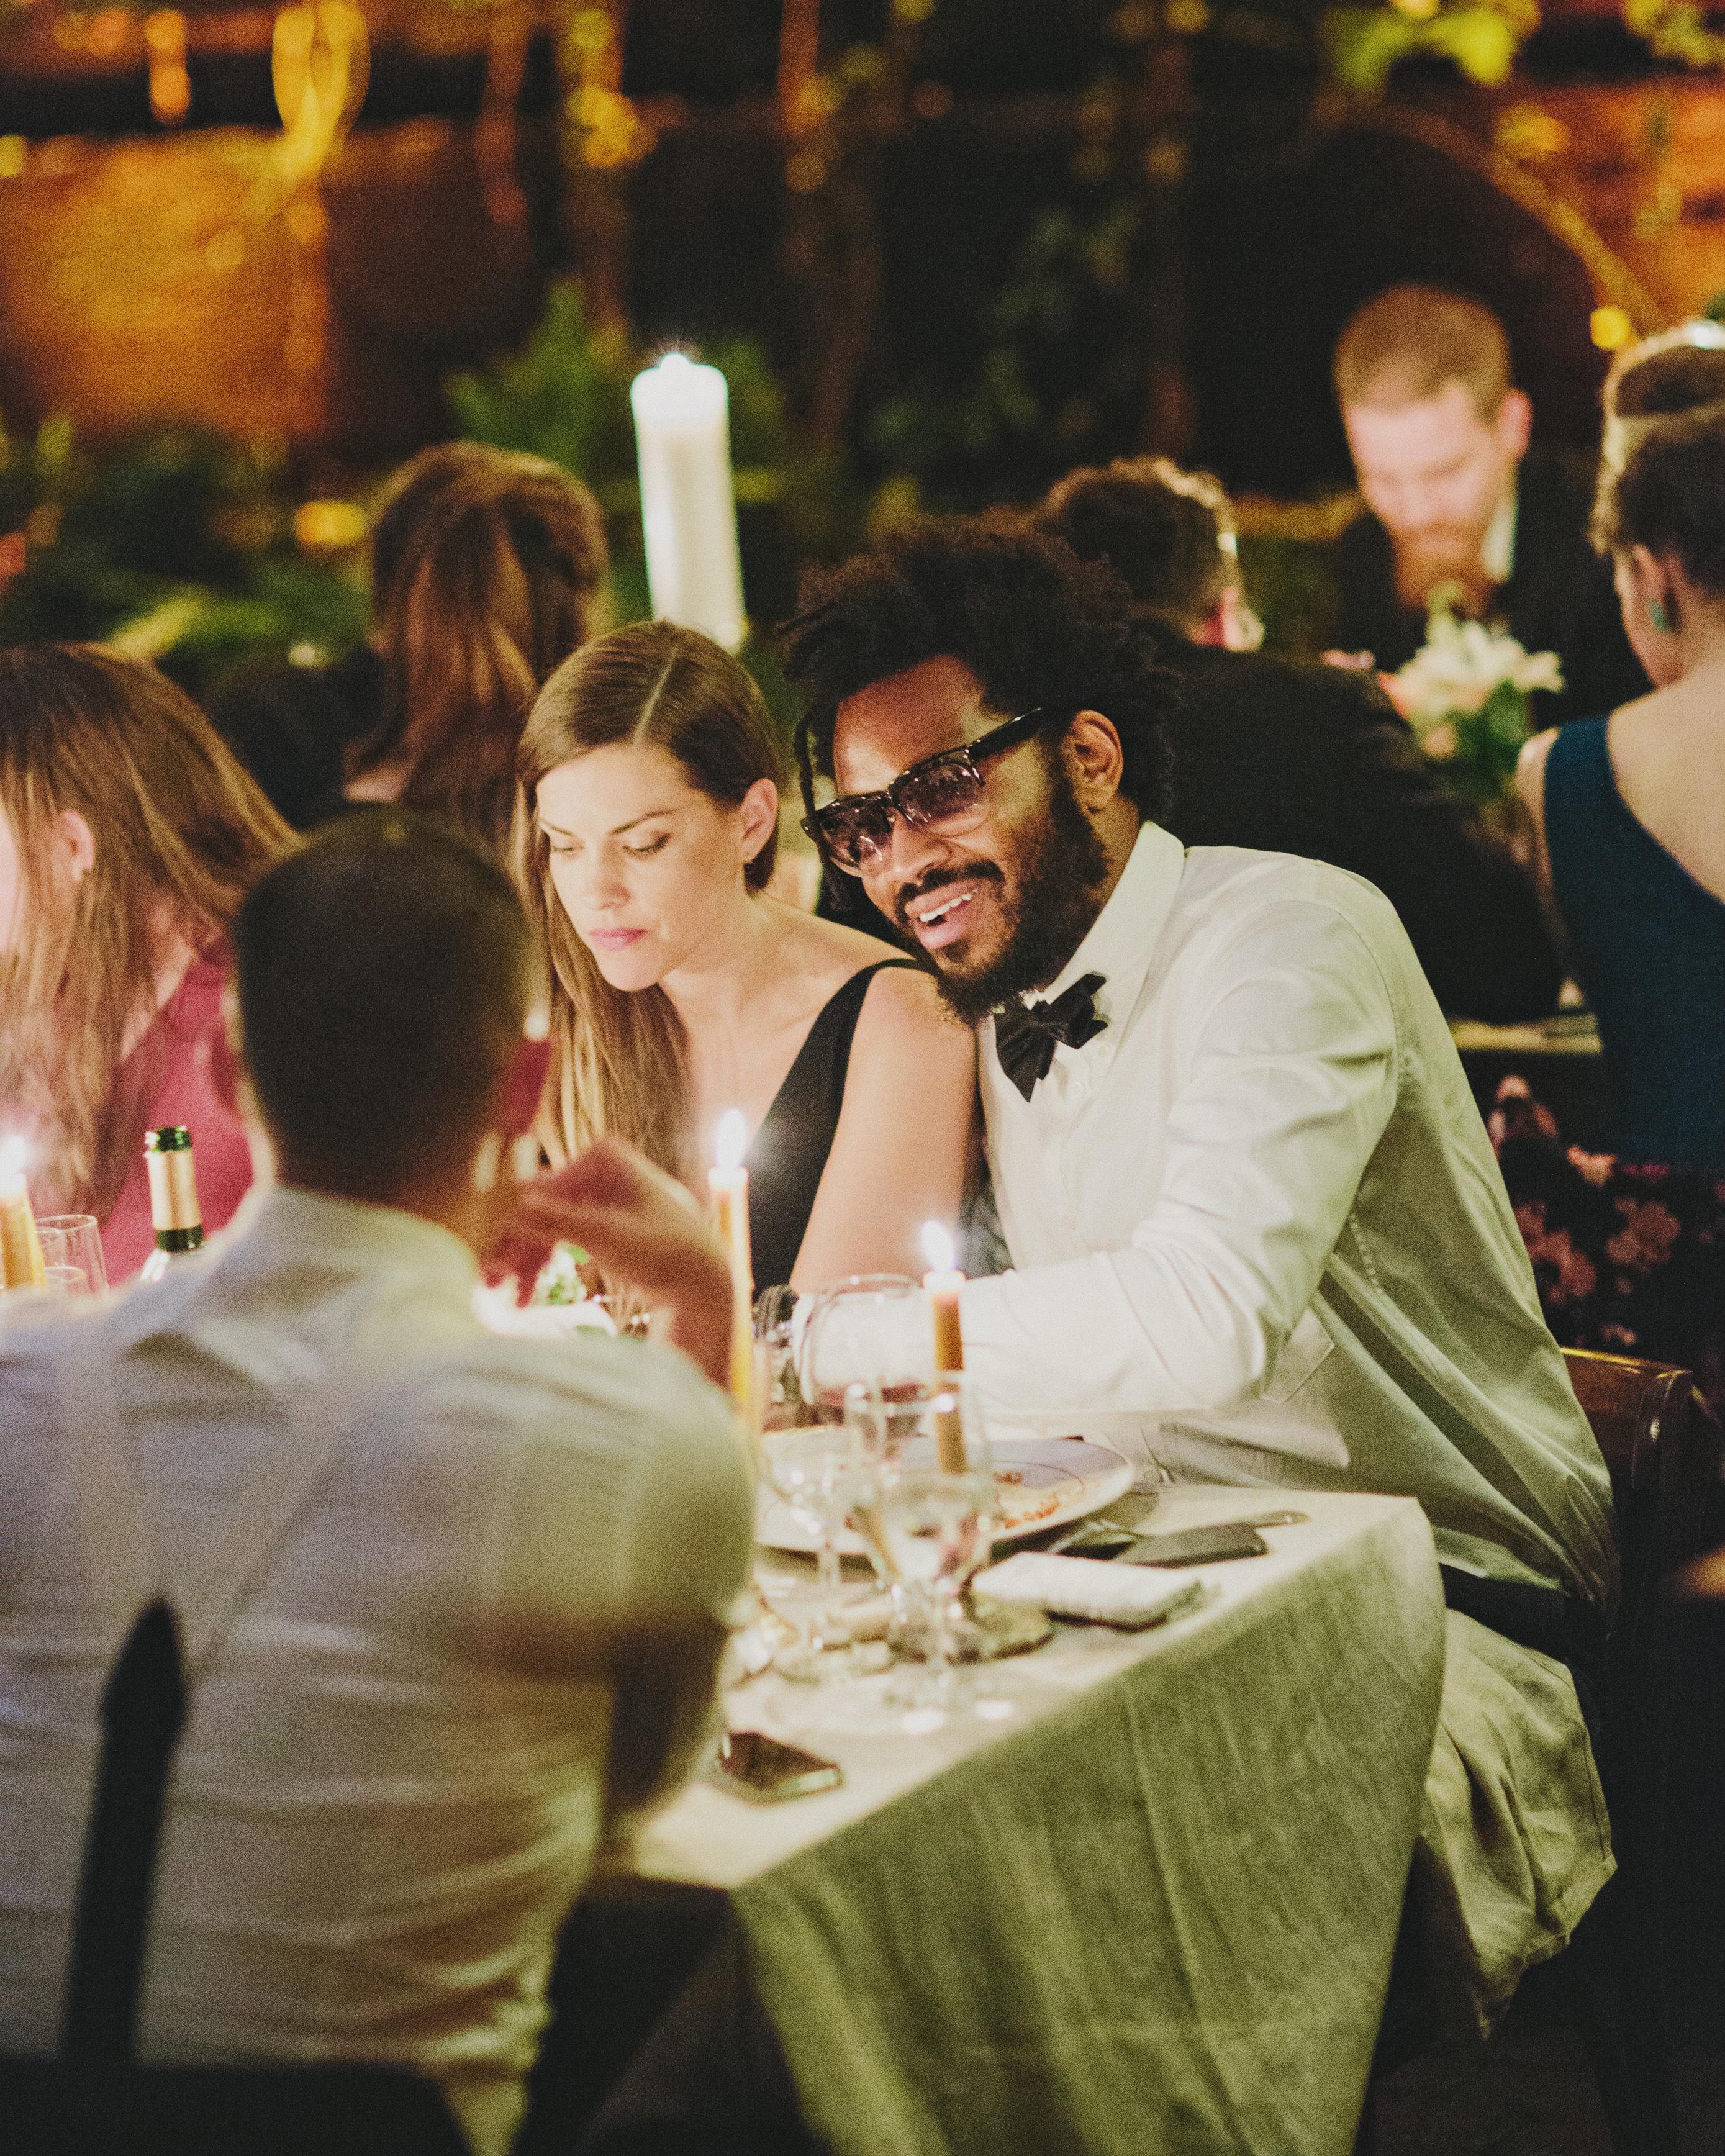 tina-raul-wedding-reception-0314.jpg